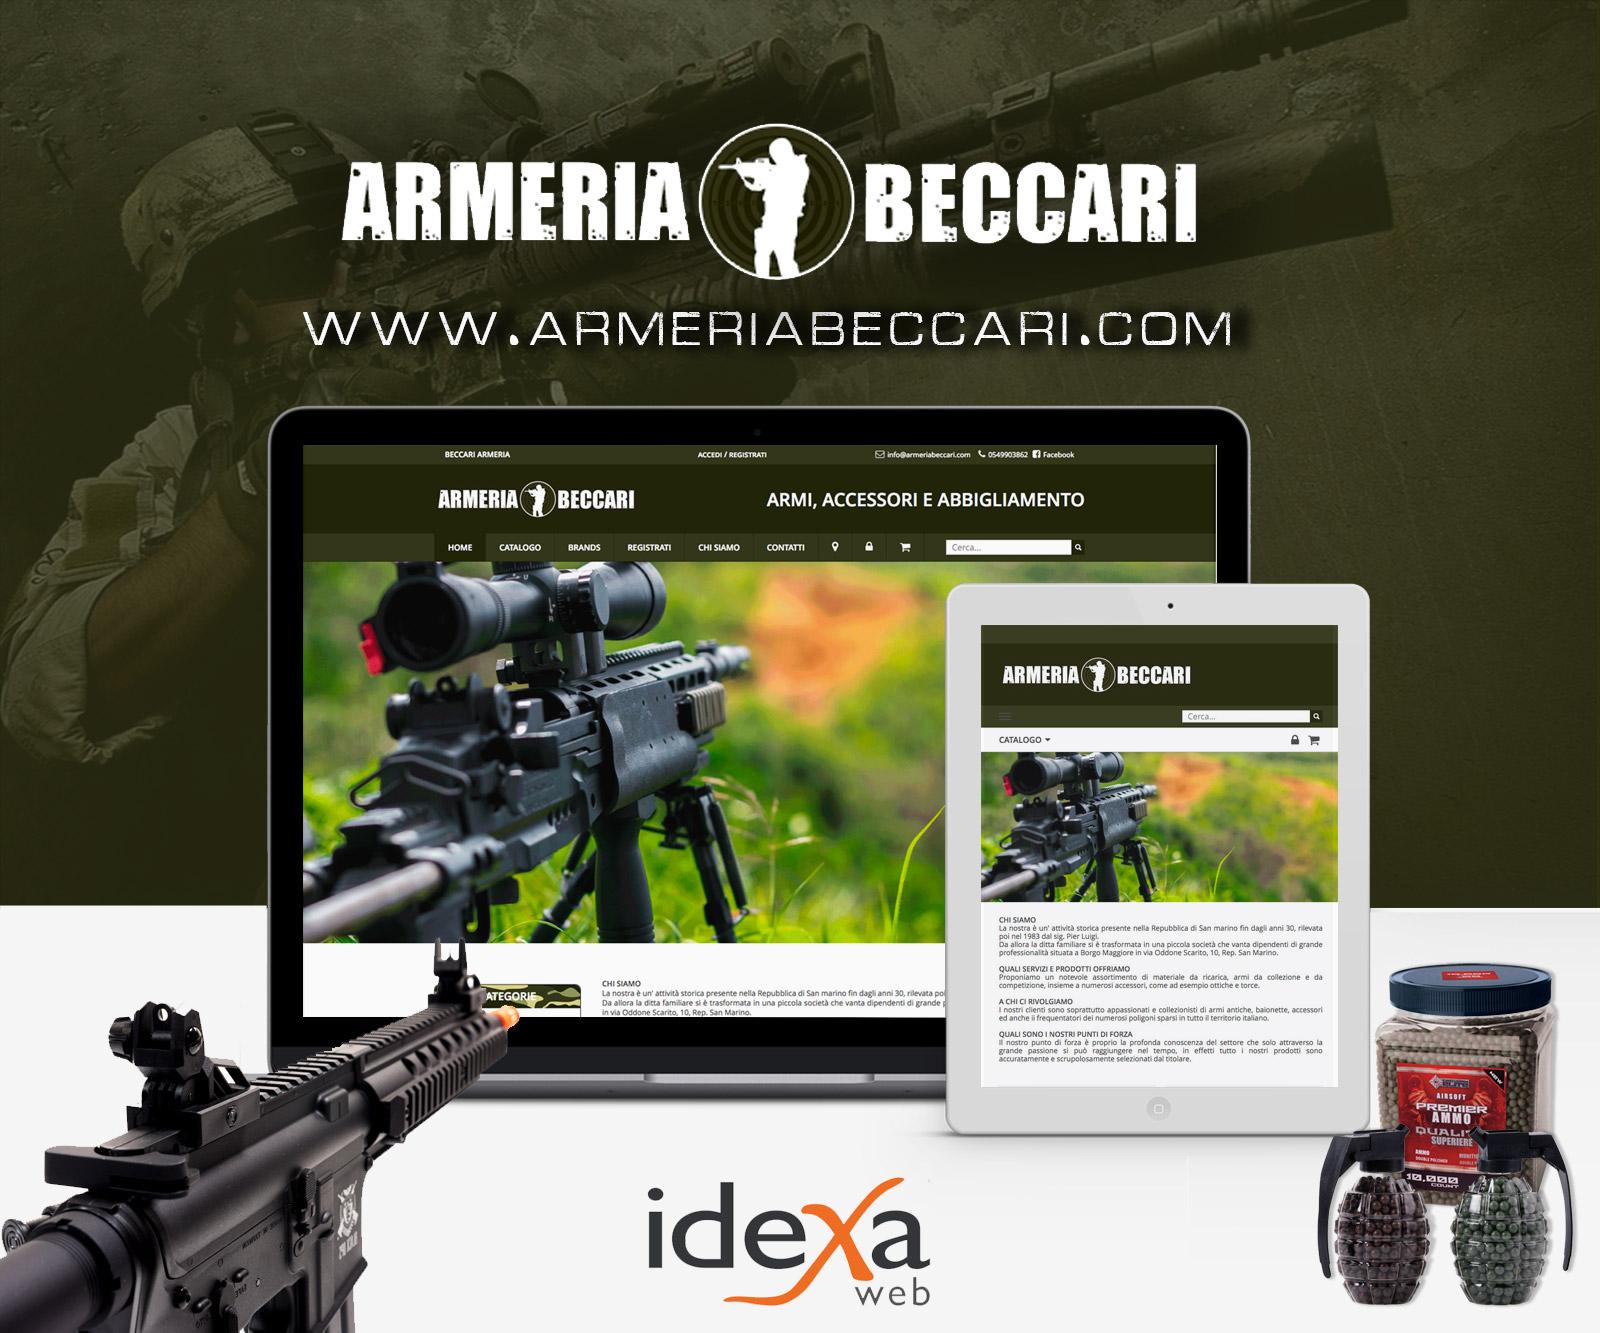 sviluppo ecommerce armeria softair